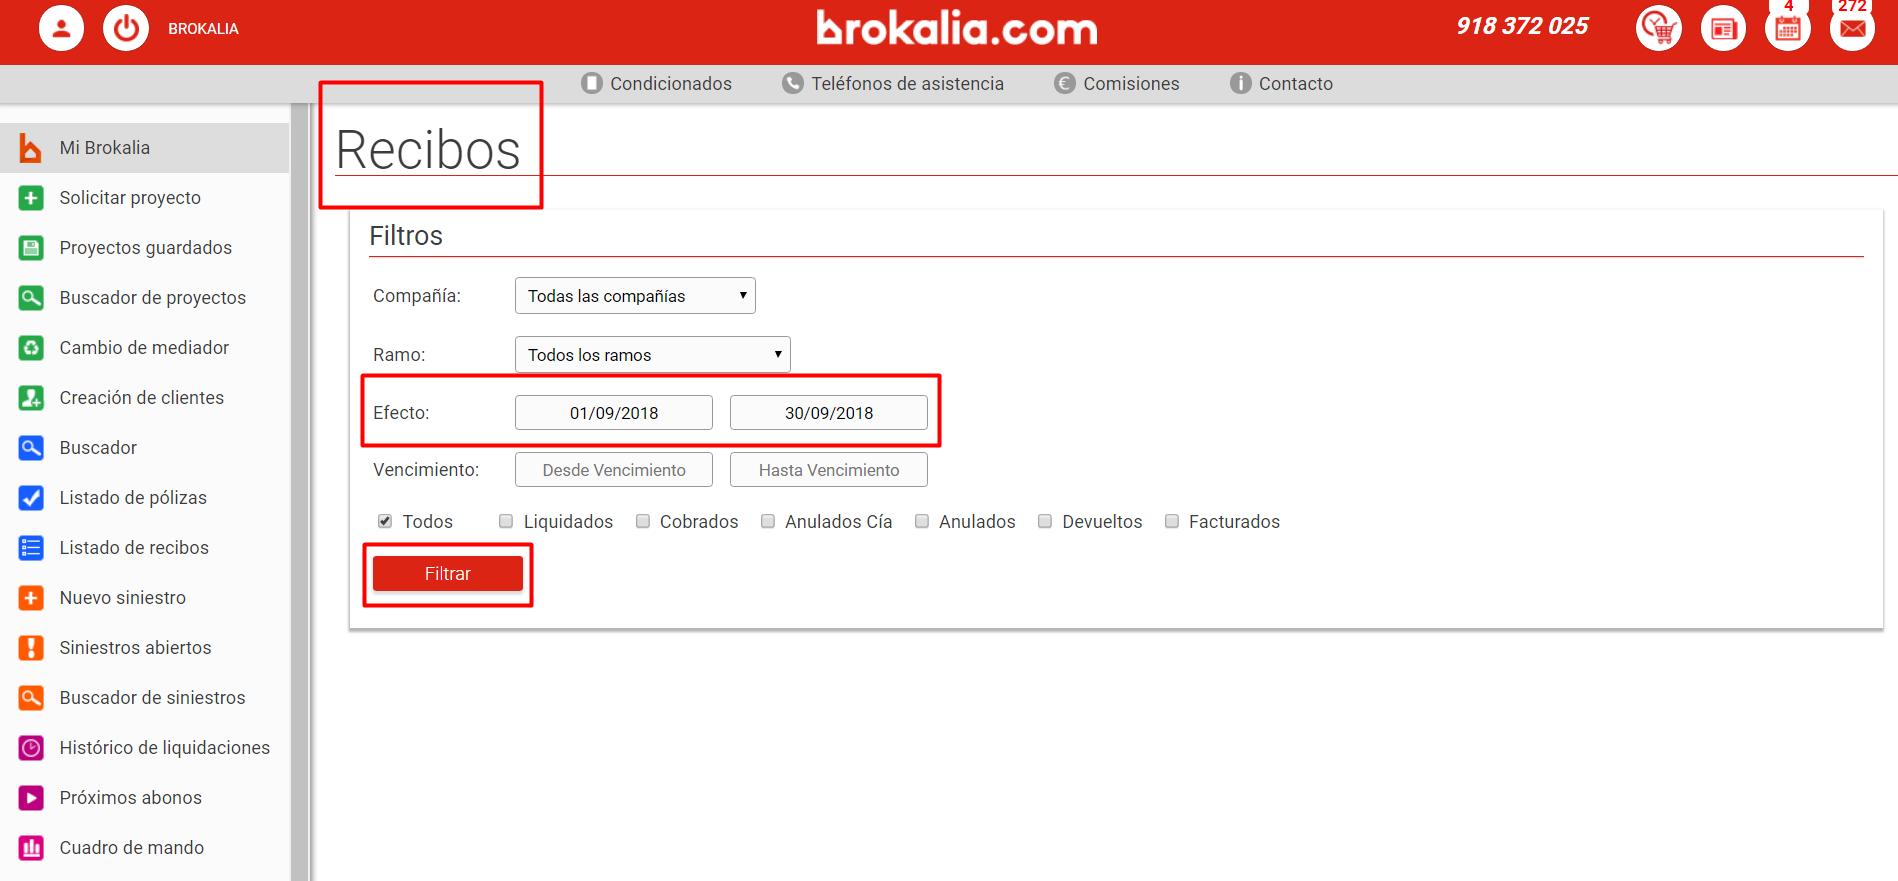 Brokalia-Recibo